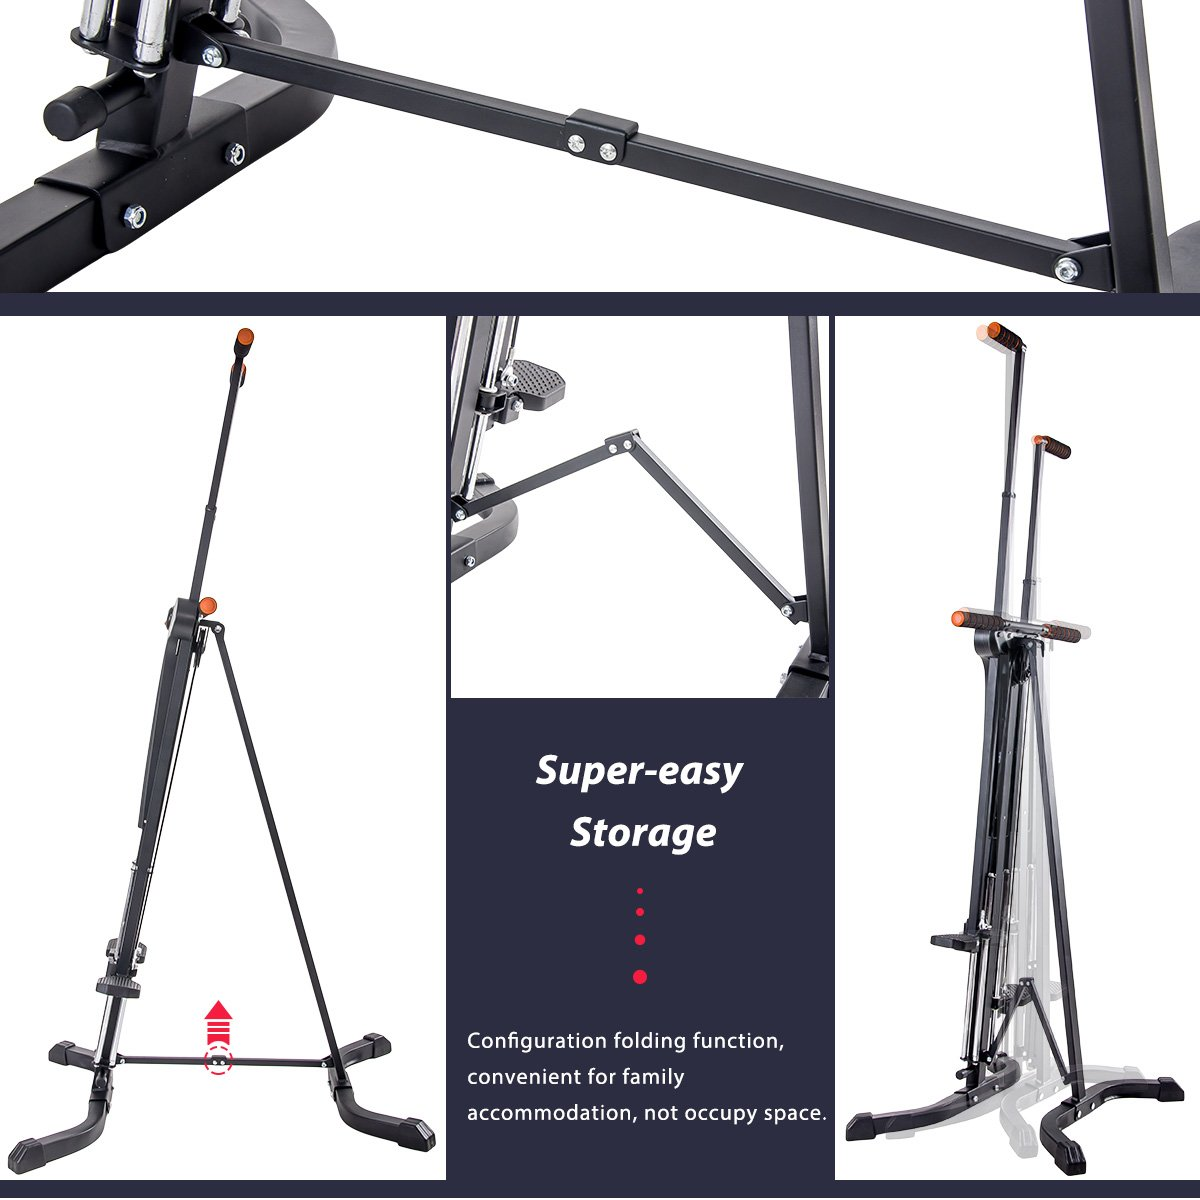 Merax Vertical Climber Fitness Climbing Cardio Machine Full Total Body Workout Fitness Folding Climber 2.0 (Black) by Merax (Image #3)